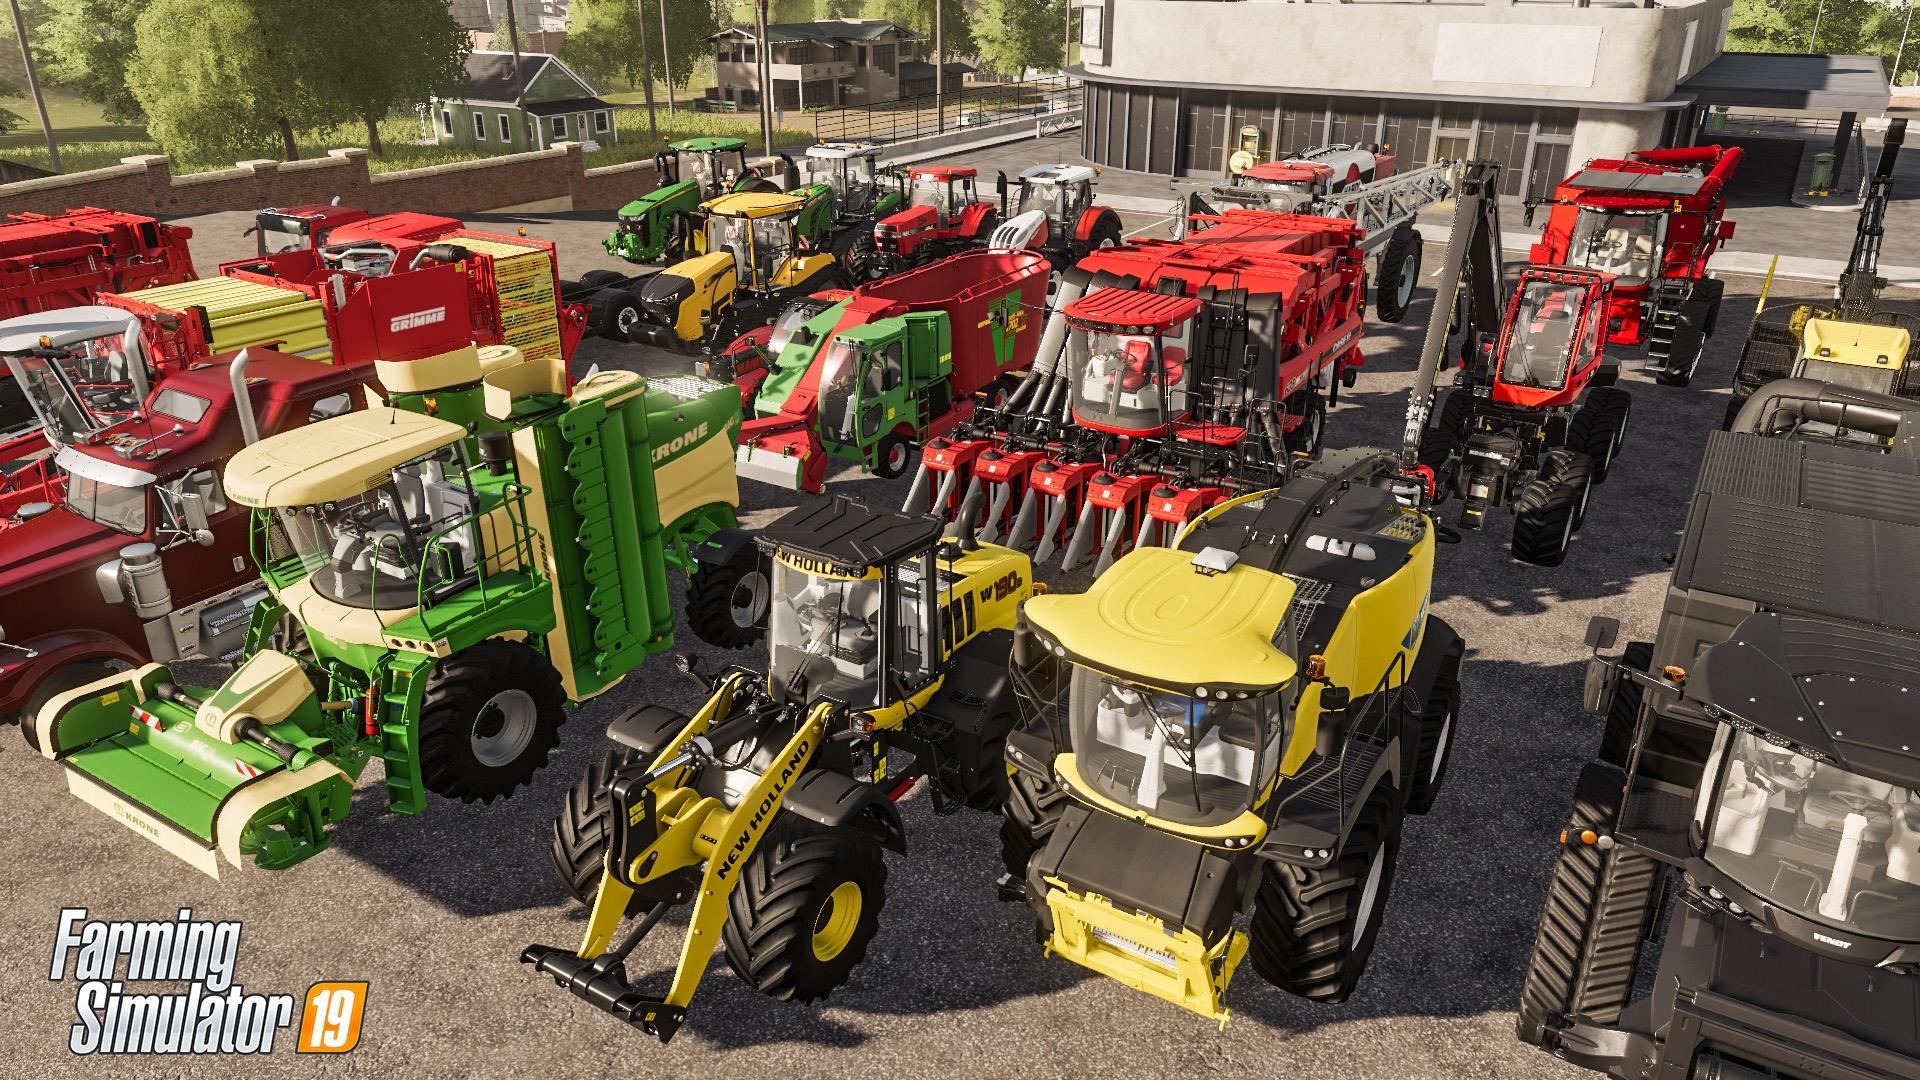 Farming Simulator 19 | WW (698e4c8f-26ff-45b9-94a5-50e6b801a15a)